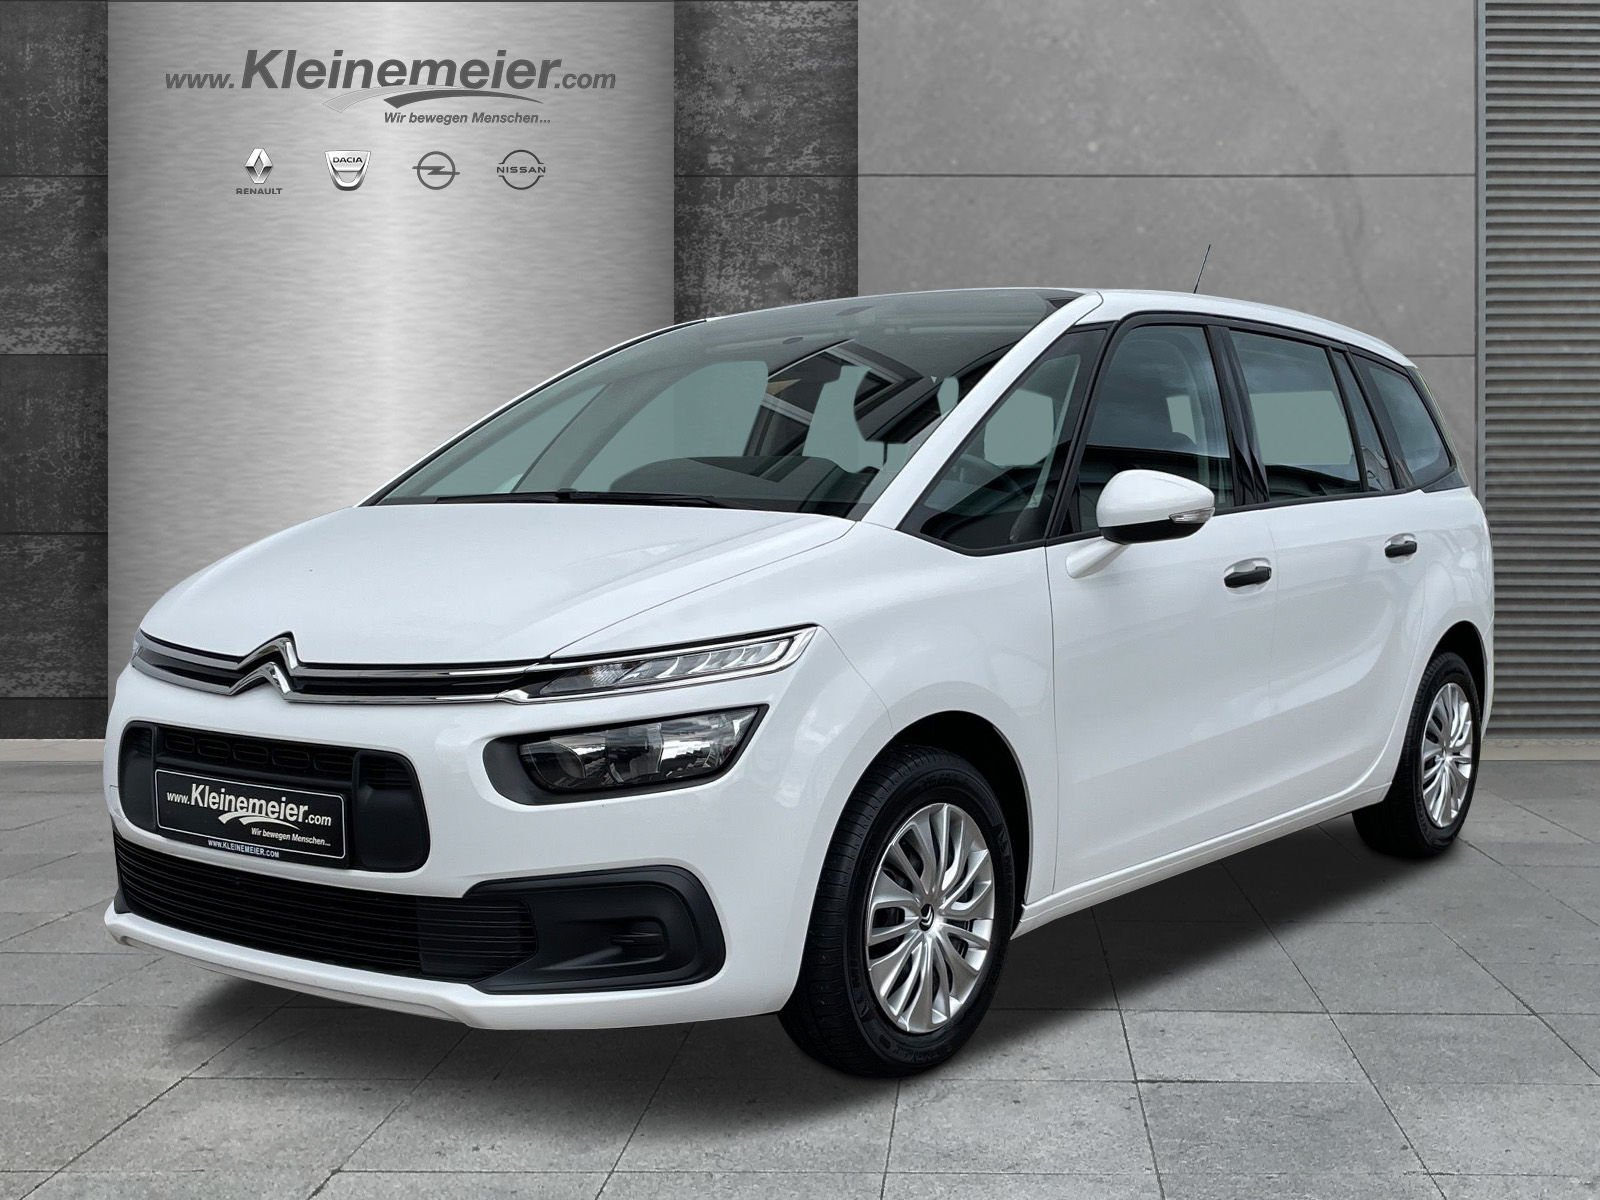 Citroën C4 Grand Picasso 1.2 PureTech Live*AHK*Klima*, Jahr 2018, Benzin